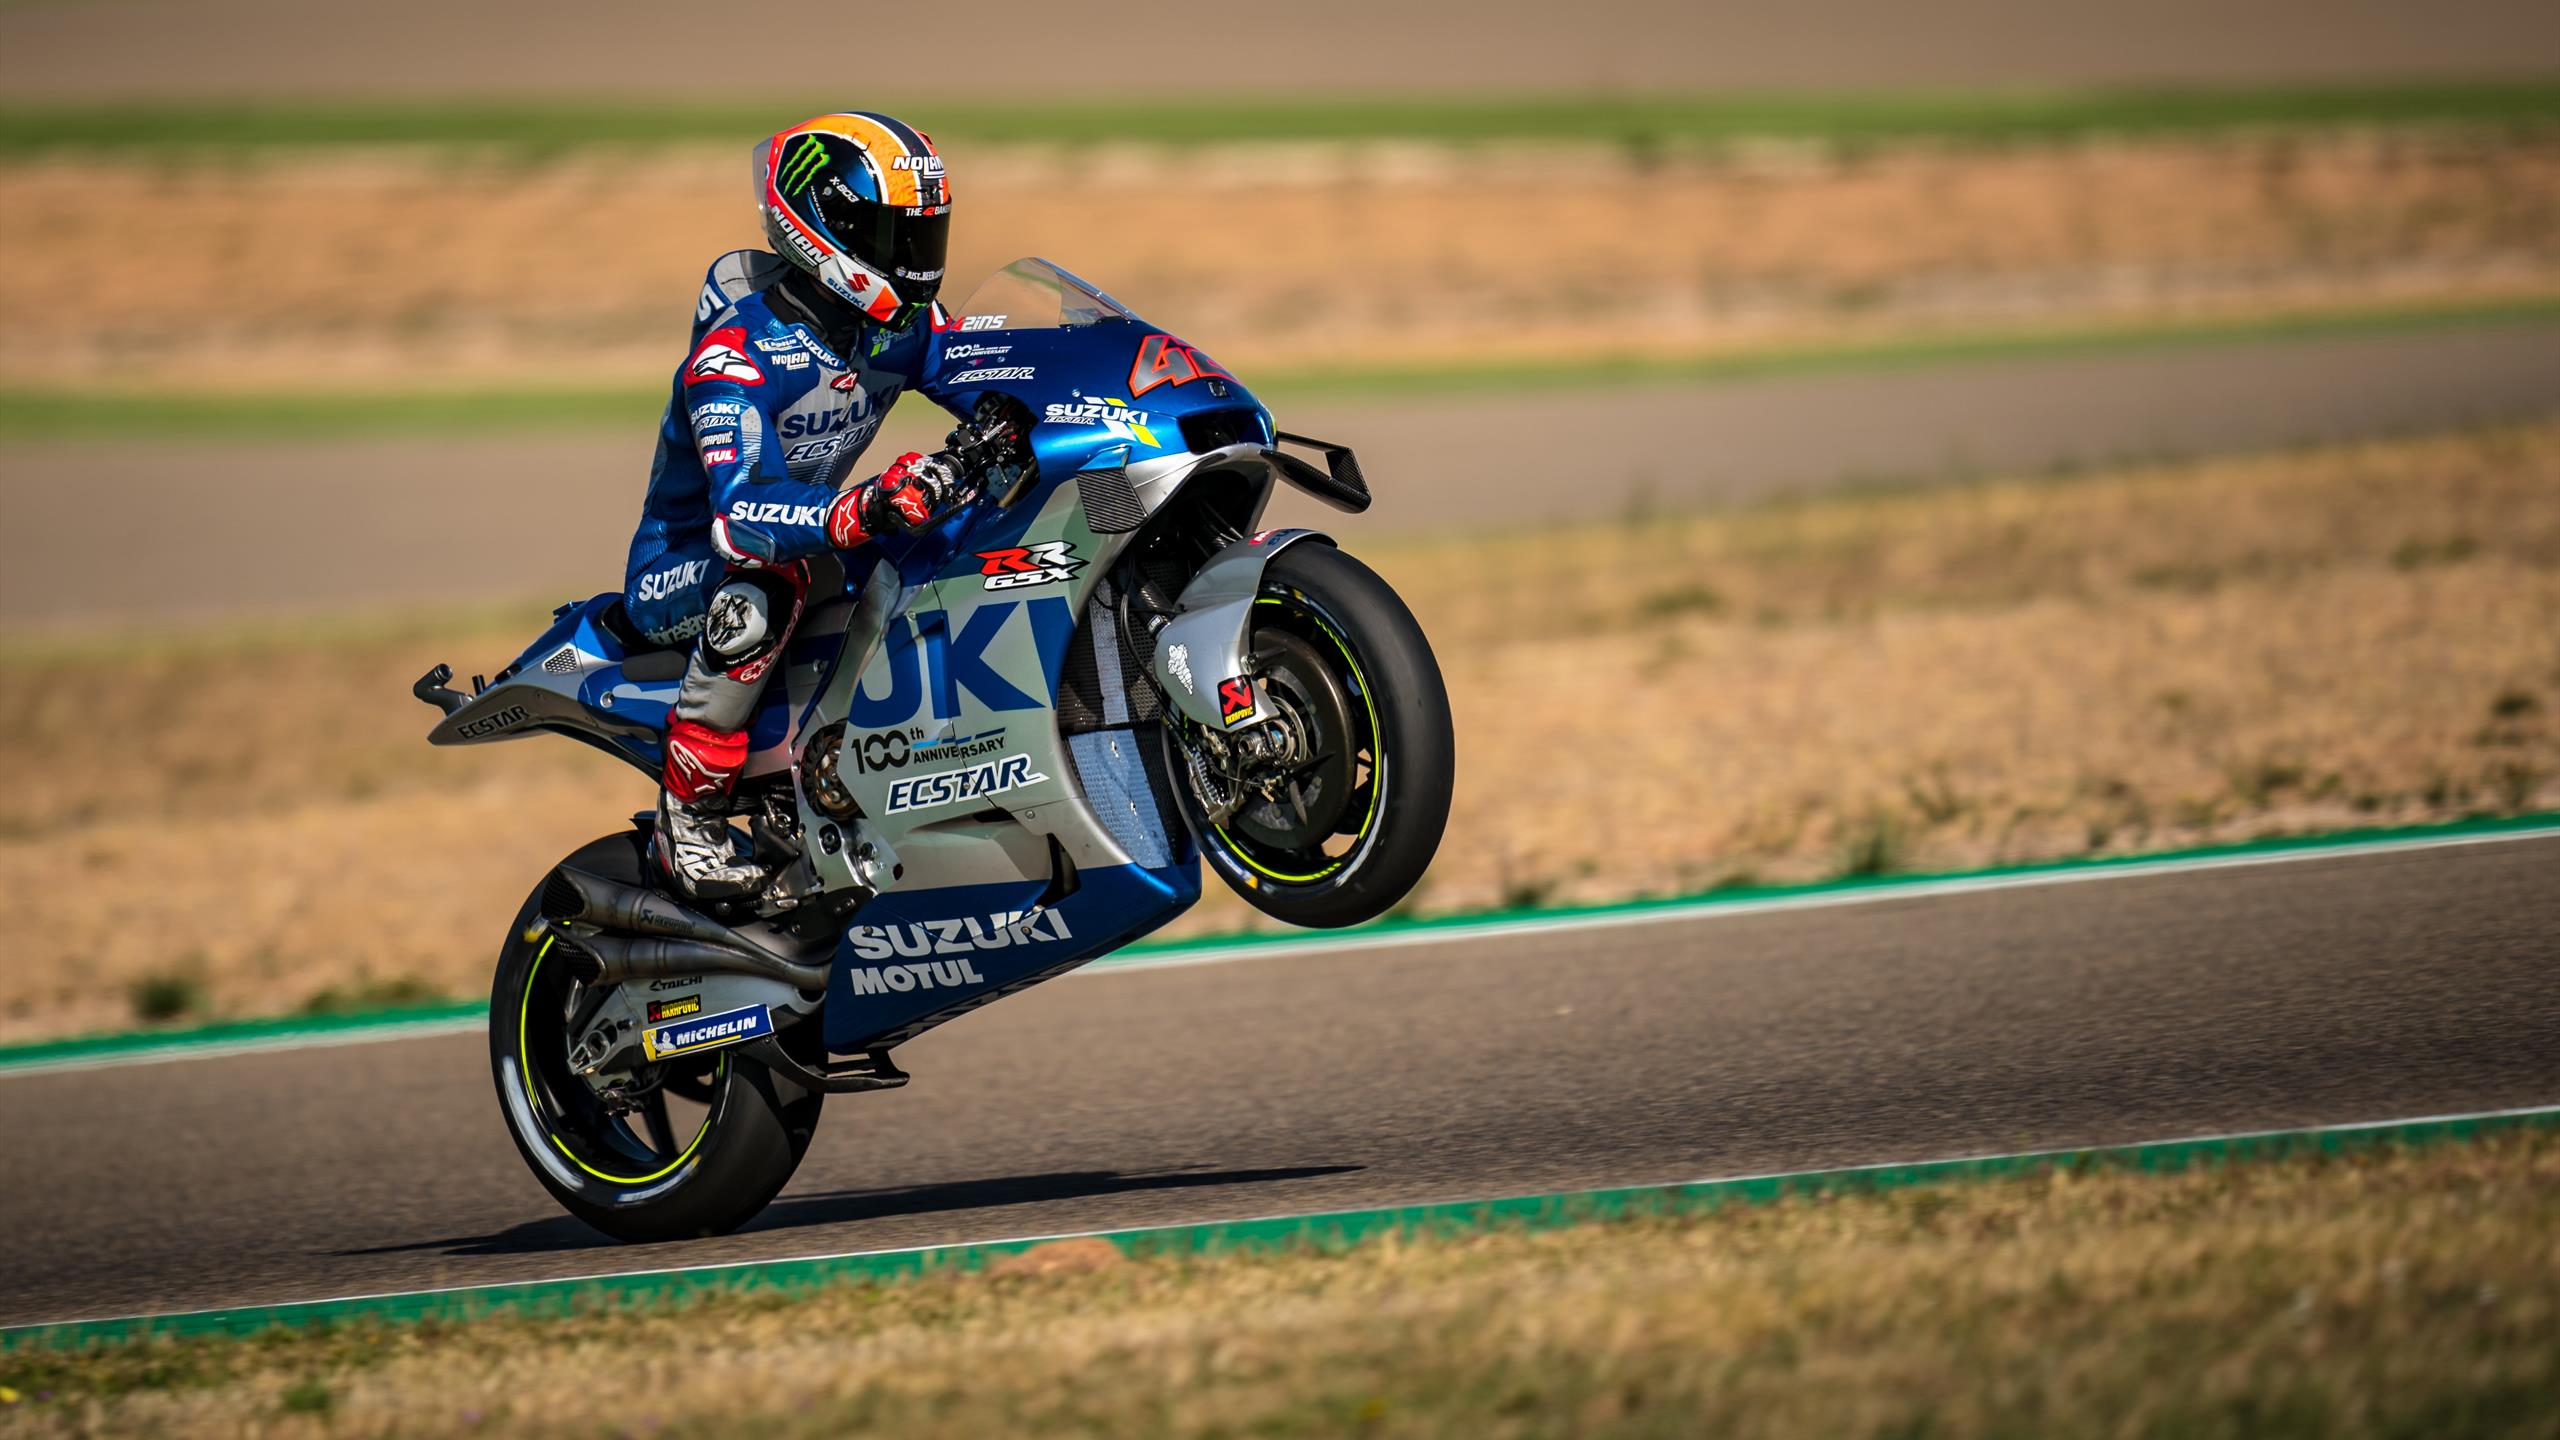 Motogp übertragung Eurosport 2021